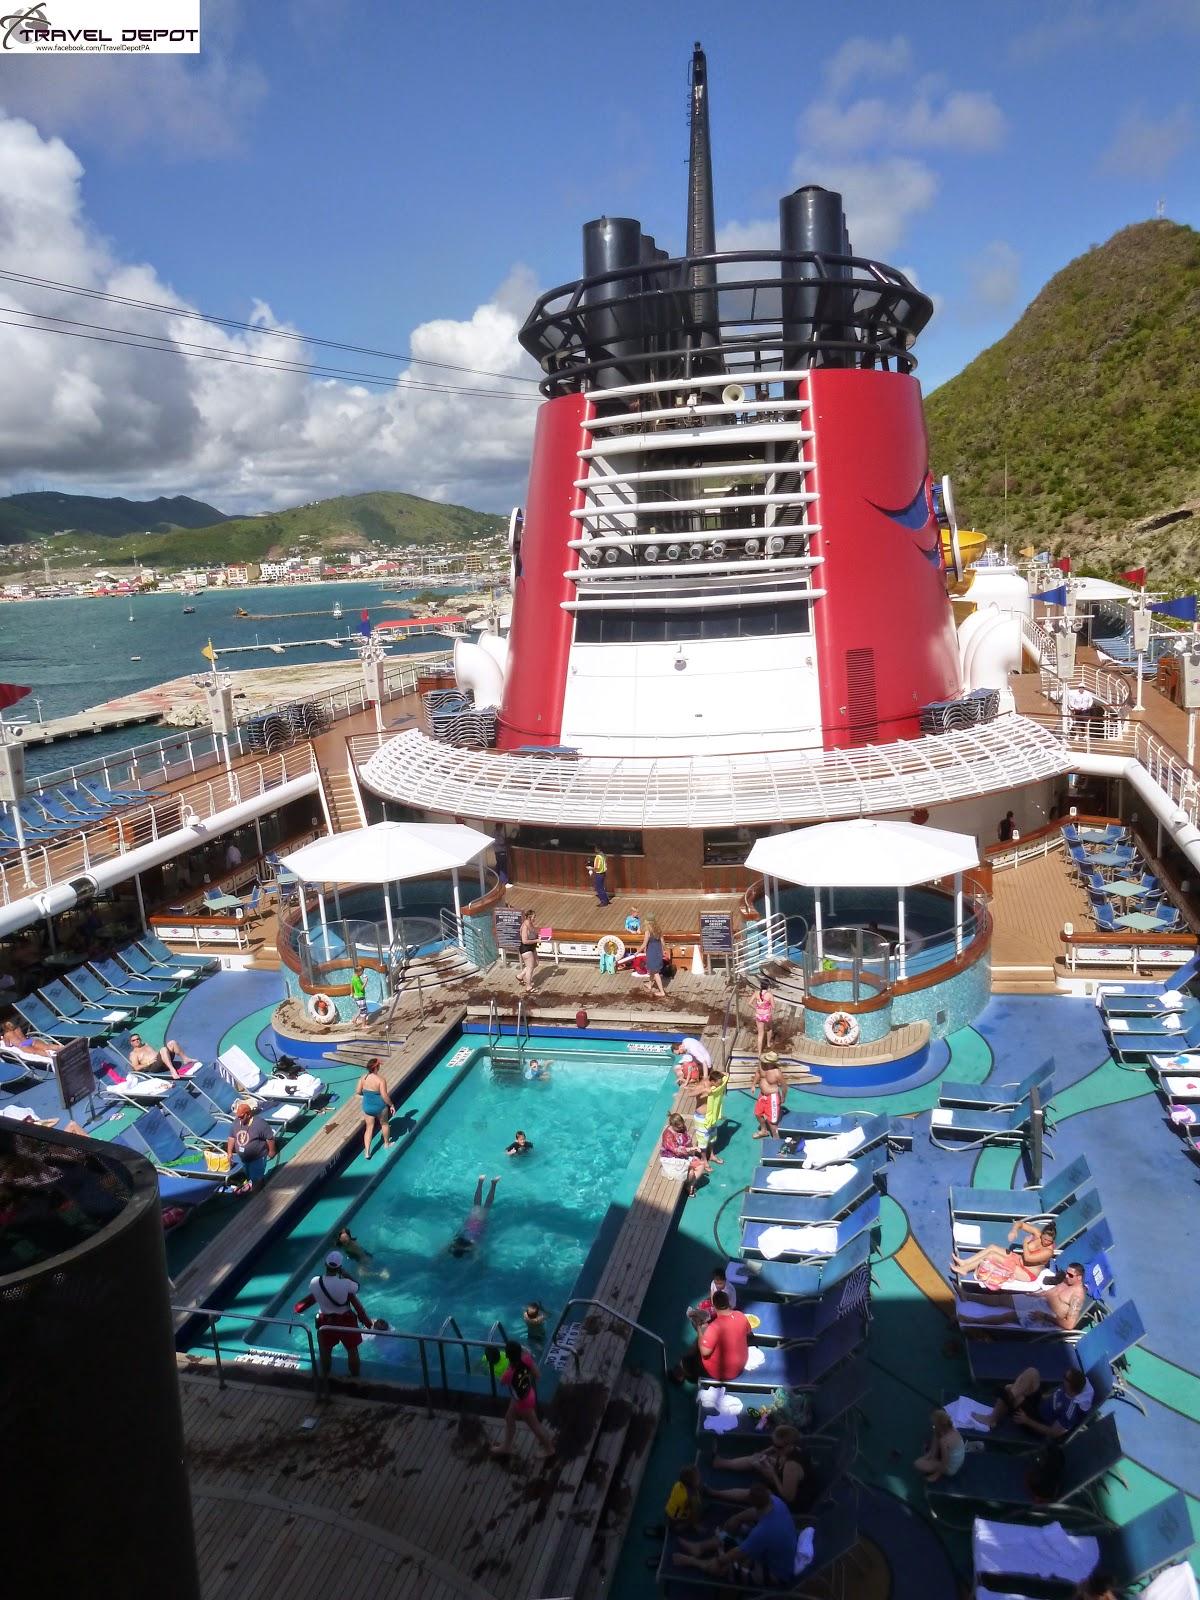 Pool Areas Aboard The Disney Magic Cruise Ship